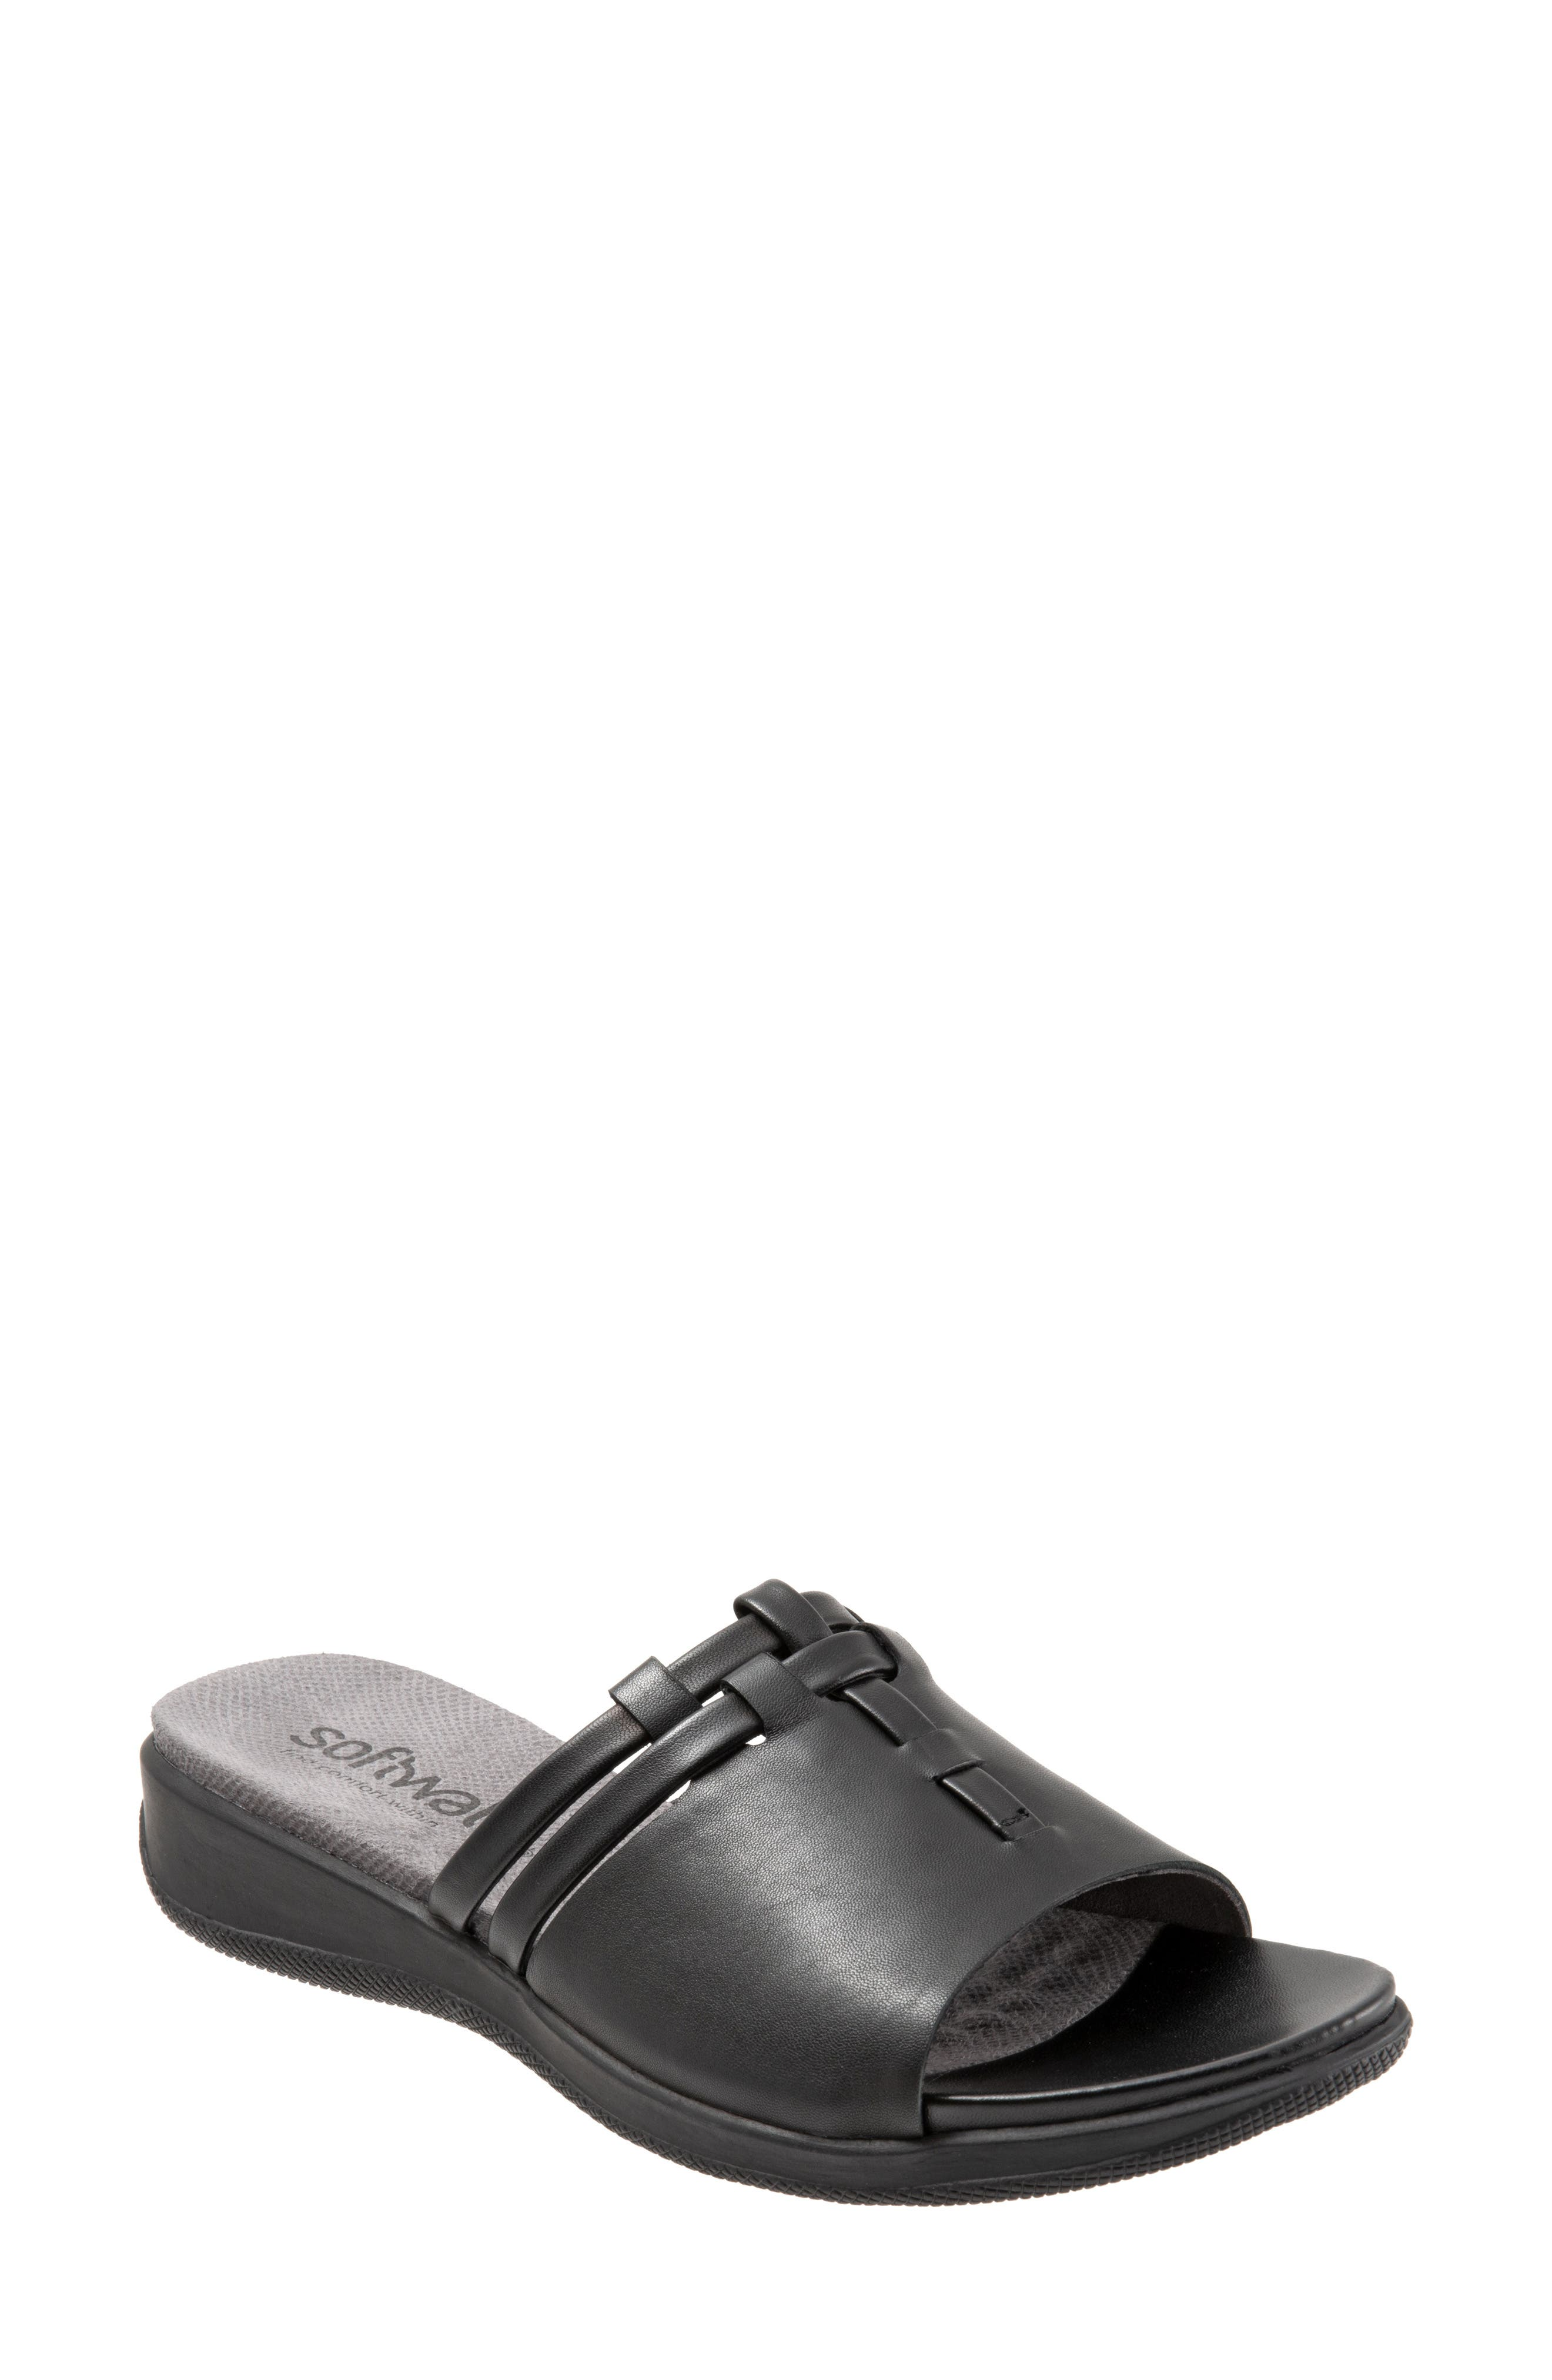 SOFTWALK<SUP>®</SUP> Tahoma Woven Slide Sandal, Main, color, BLACK LEATHER